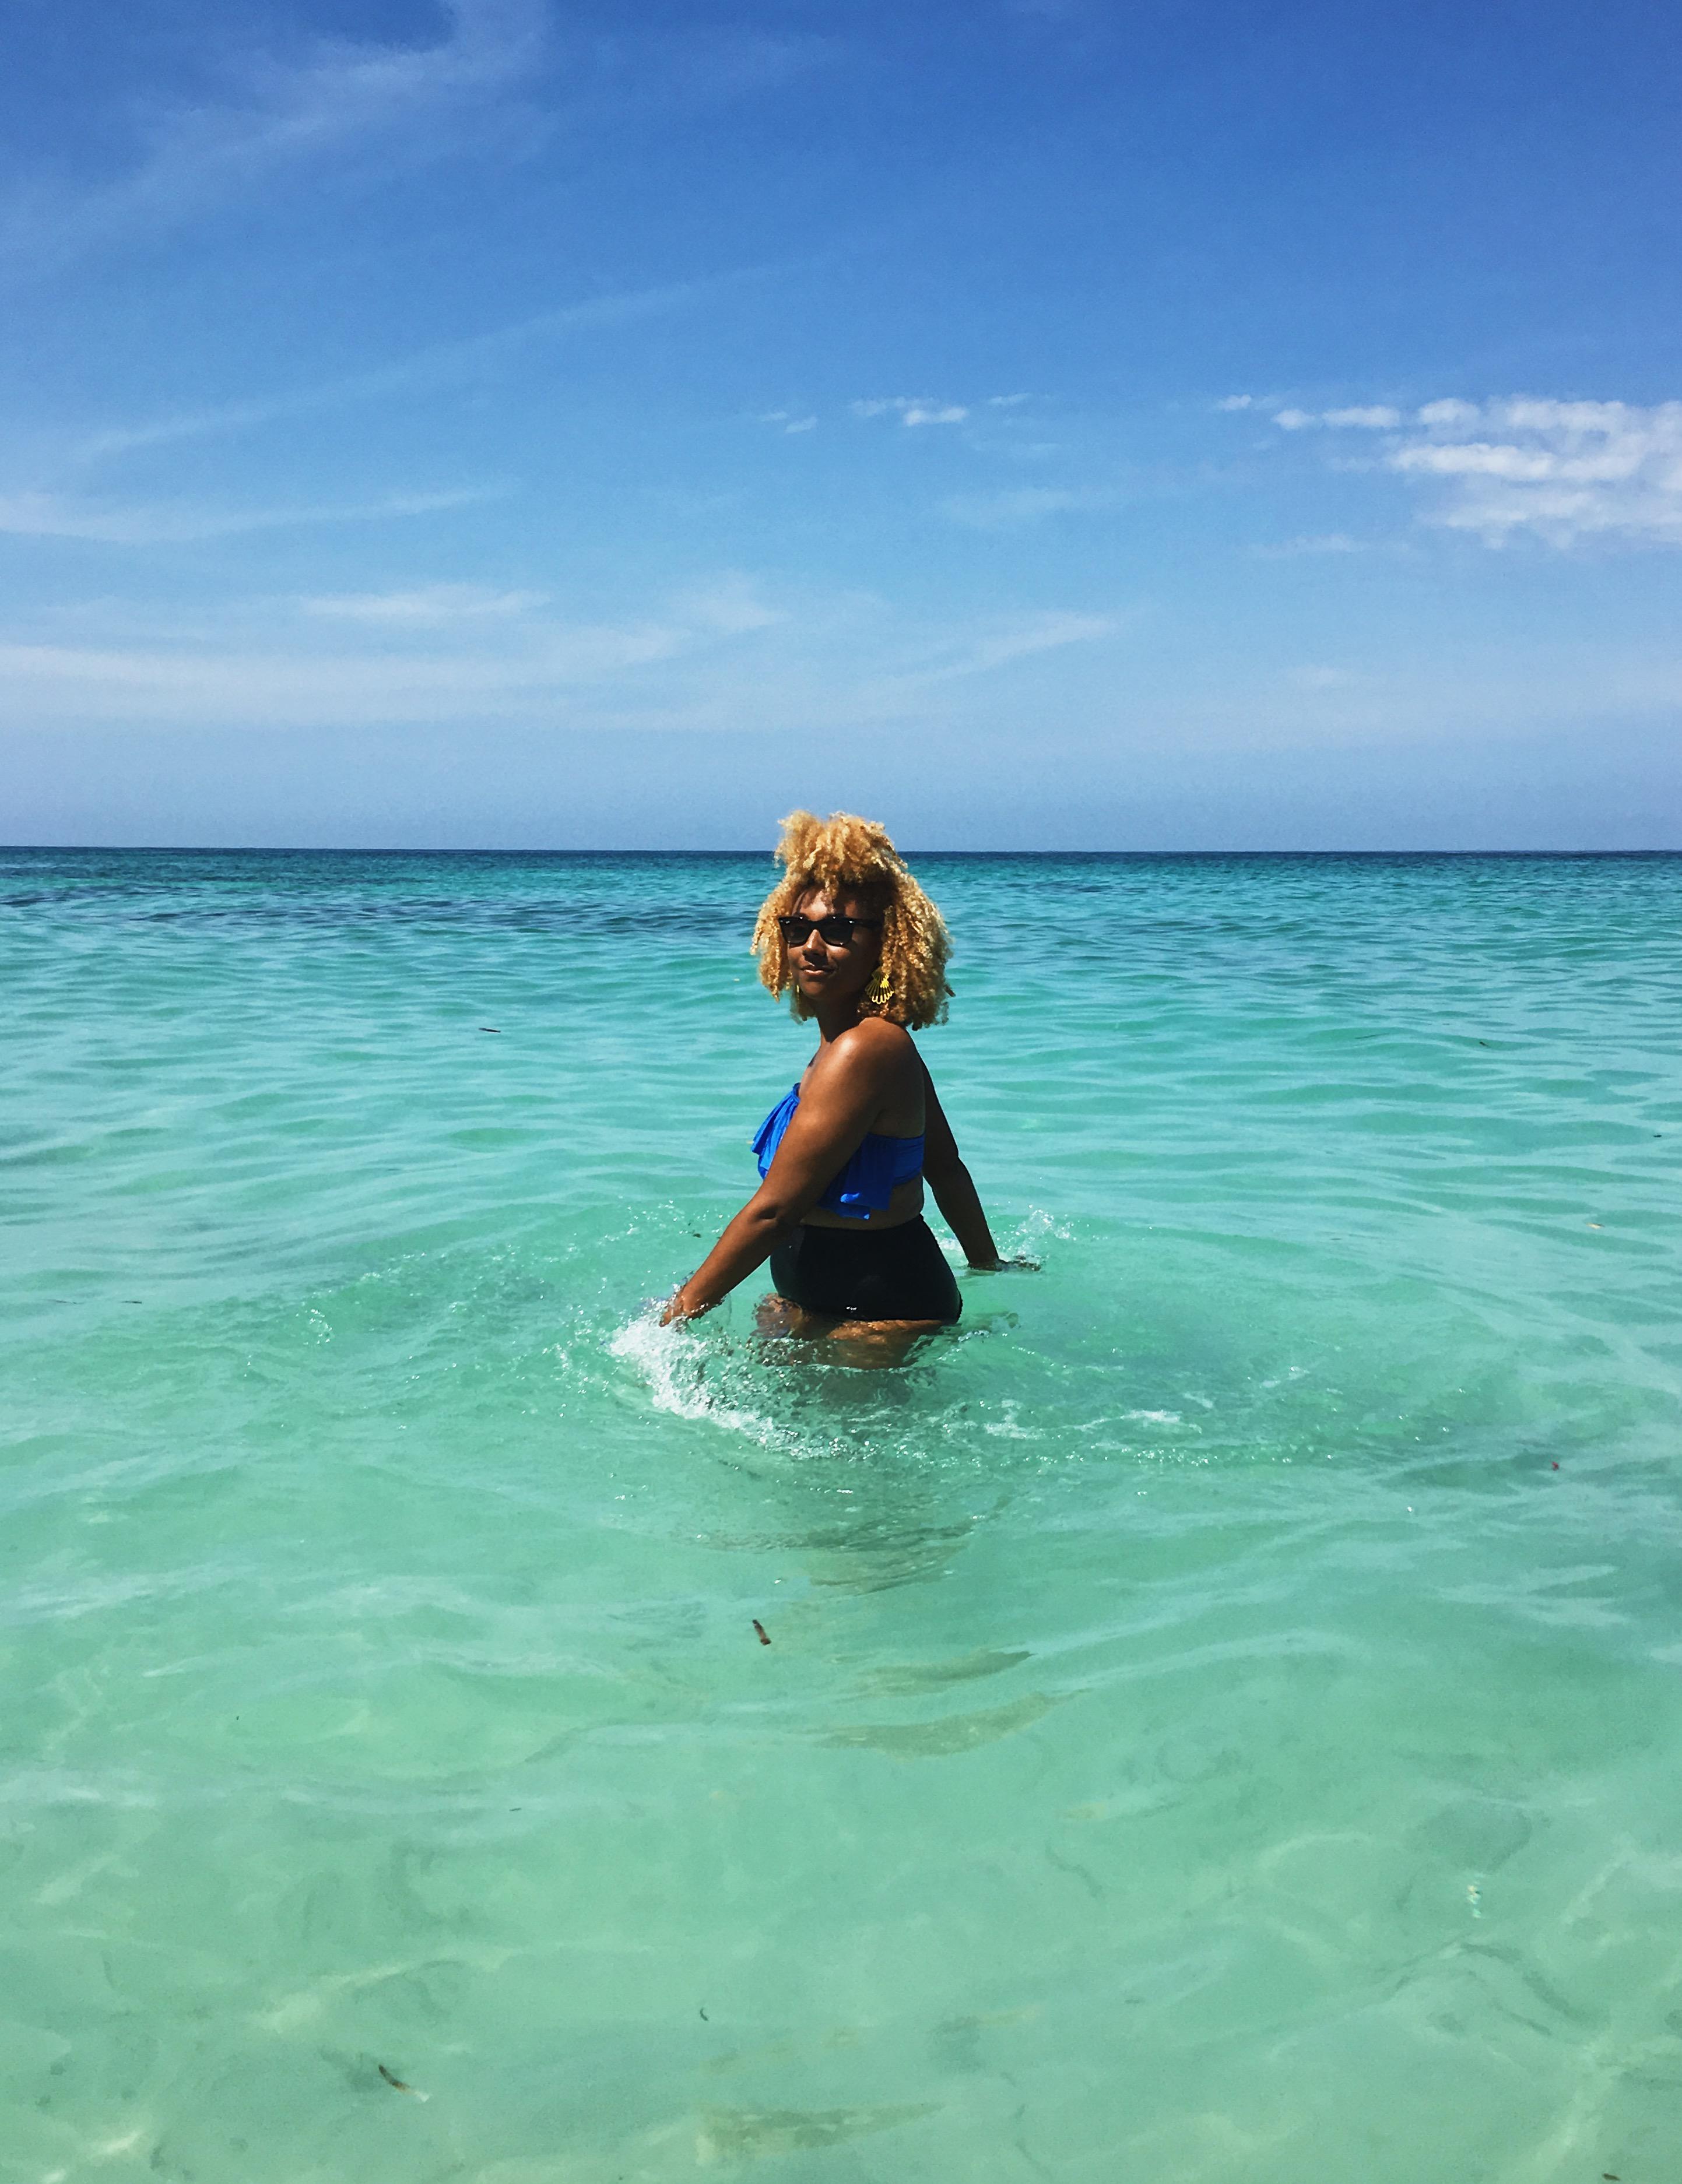 lcm-liveclothesminded-cartagena-colombia-playa blanca